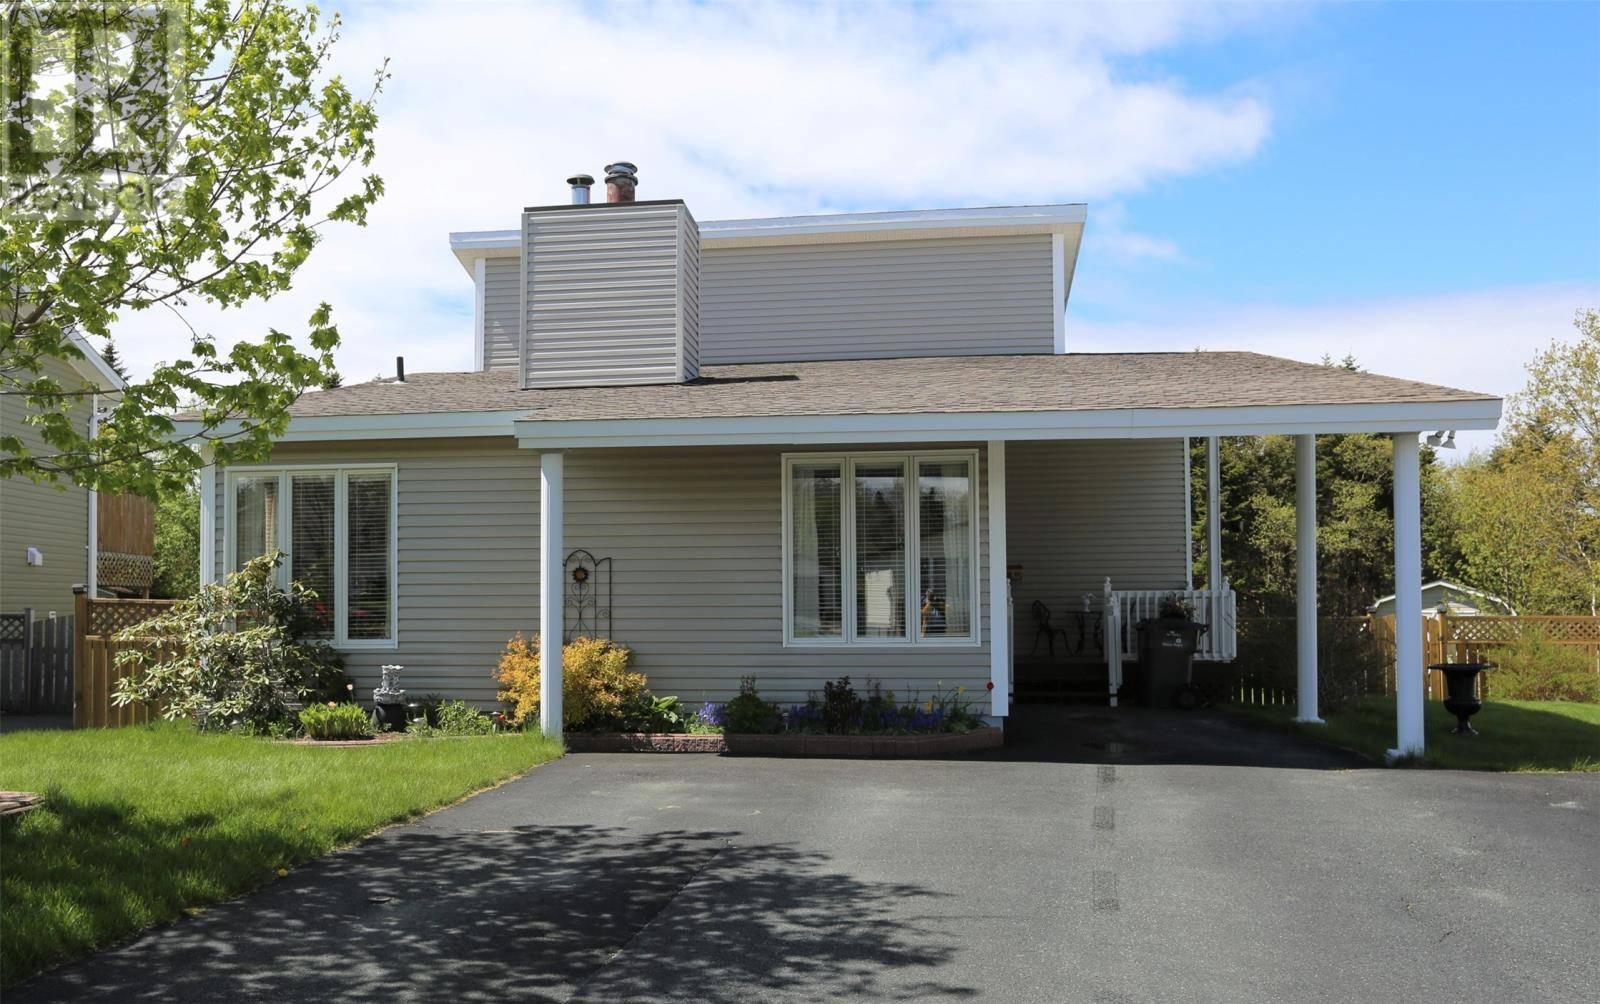 House for sale at 6 Carleton Dr Mount Pearl Newfoundland - MLS: 1197851